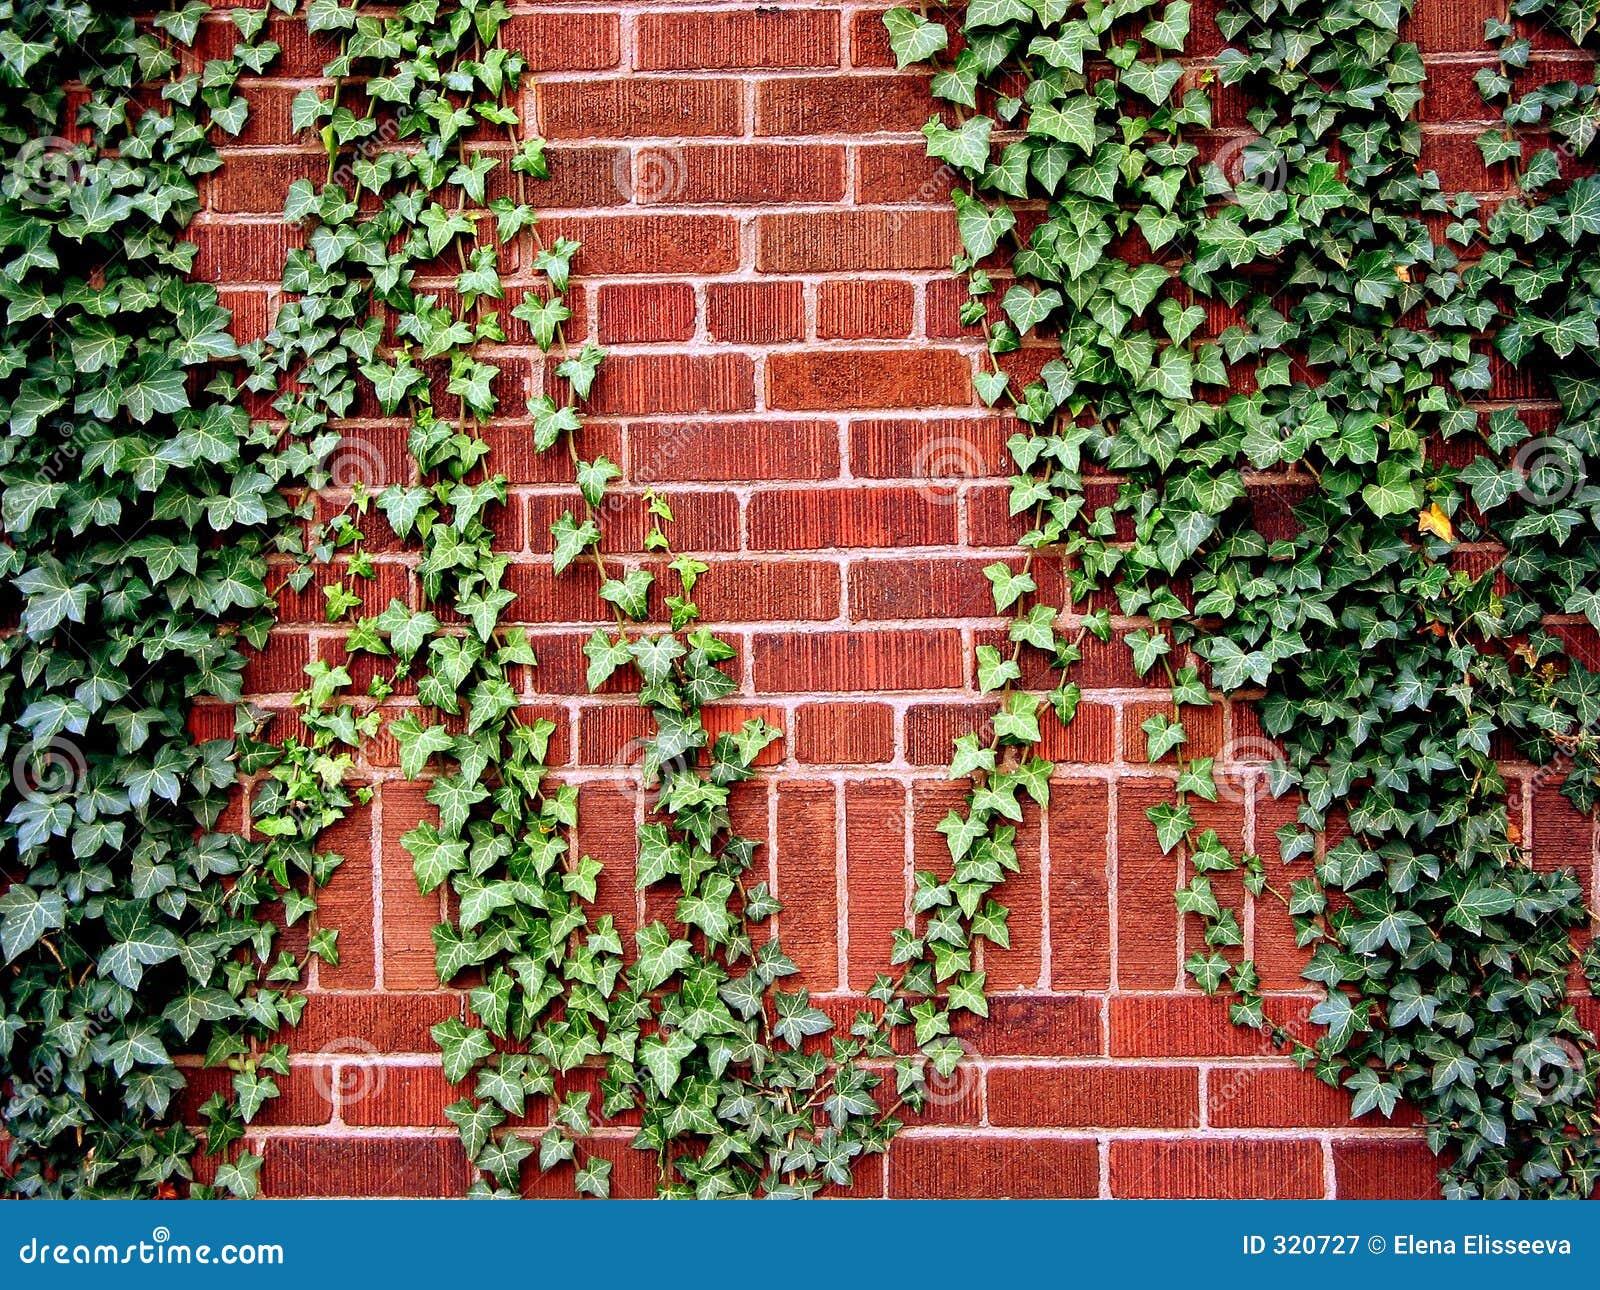 Ivy ceglana ściana